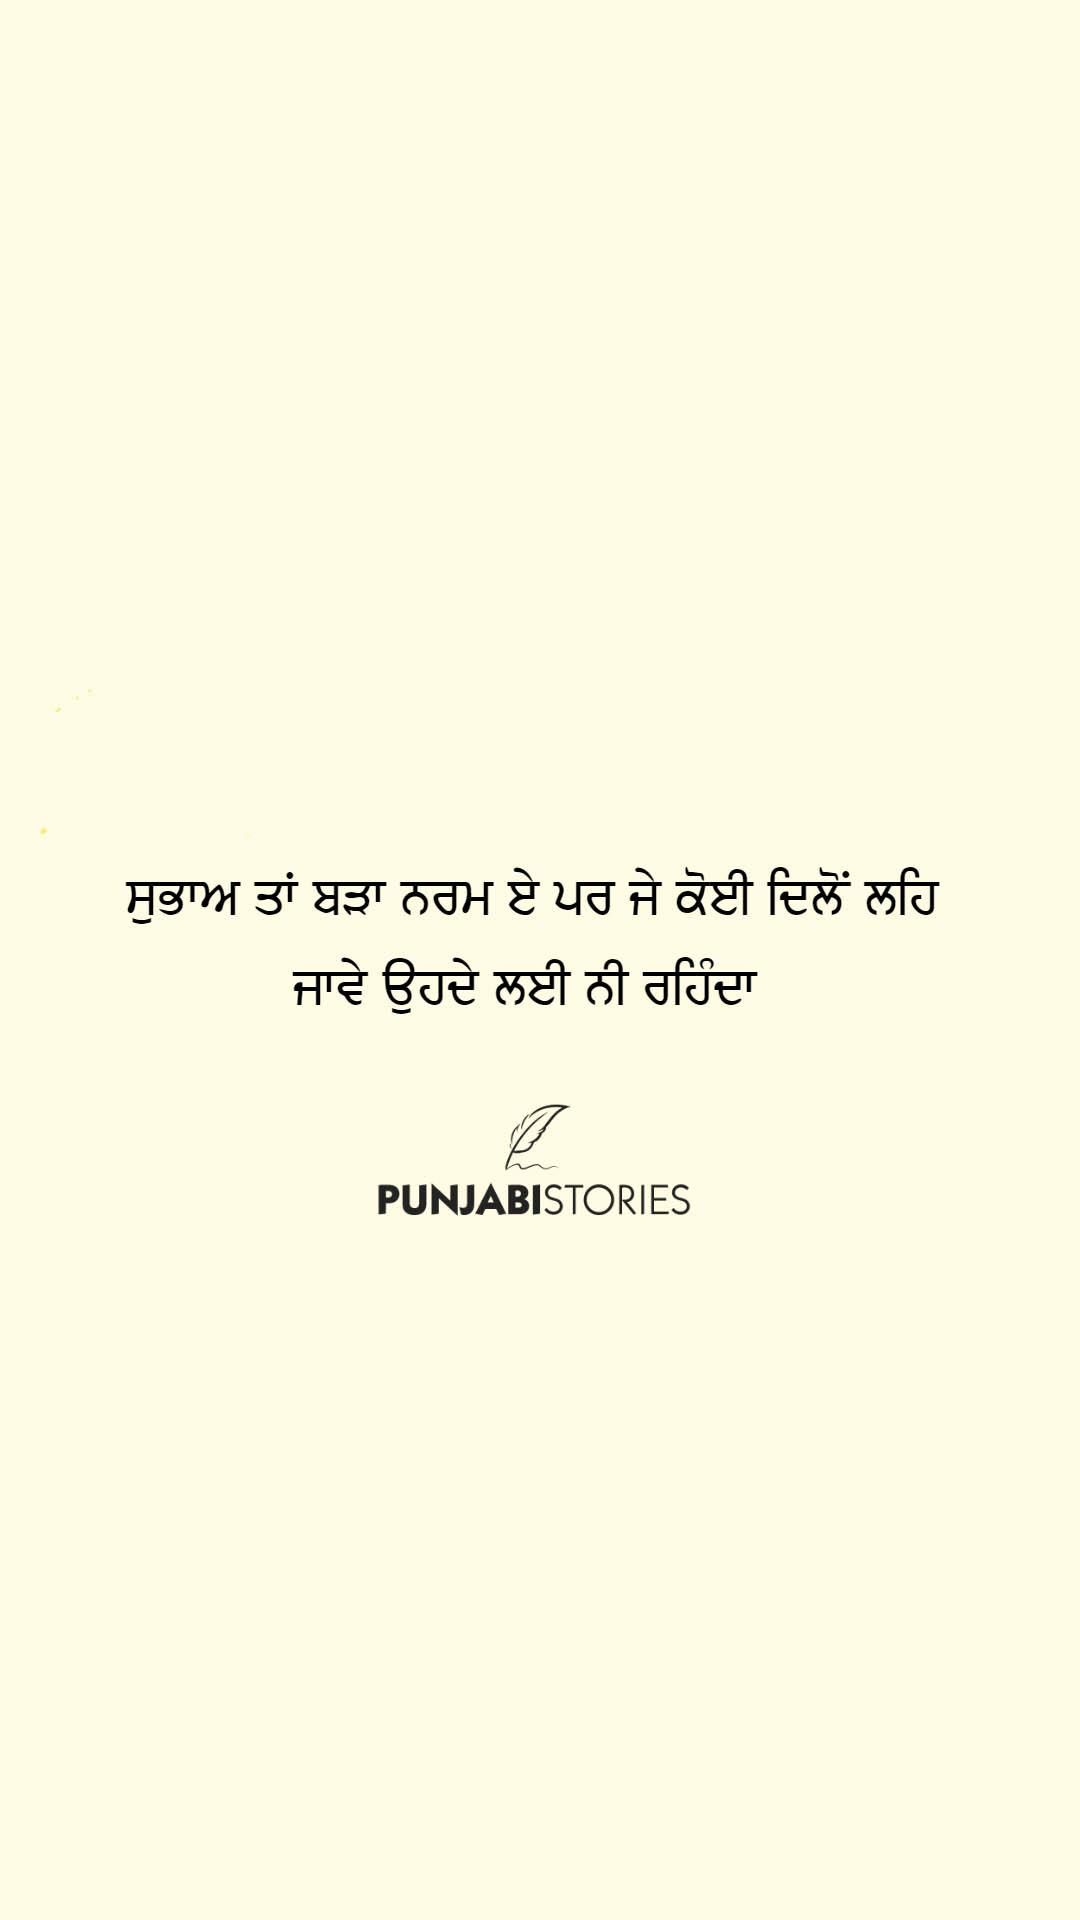 Latest 2021 Punjabi Status for Whatsapp, punjabi sad shayari on life